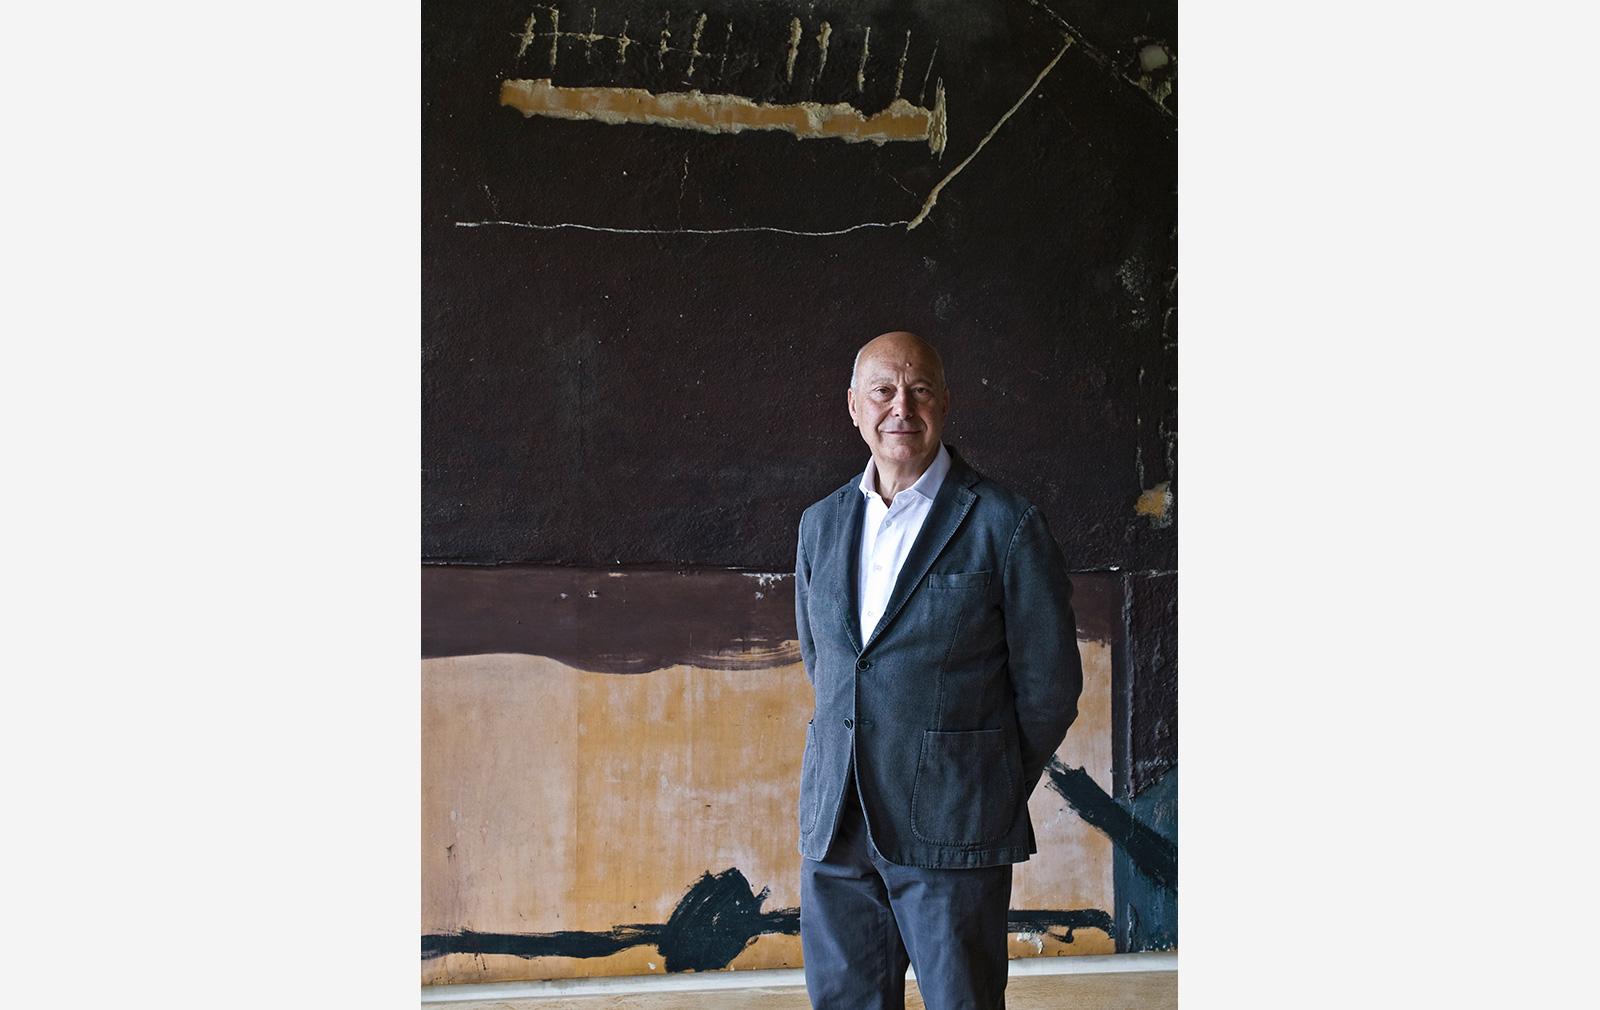 Axel Vervoordt, whose Kanaal project in Antwerp has completed